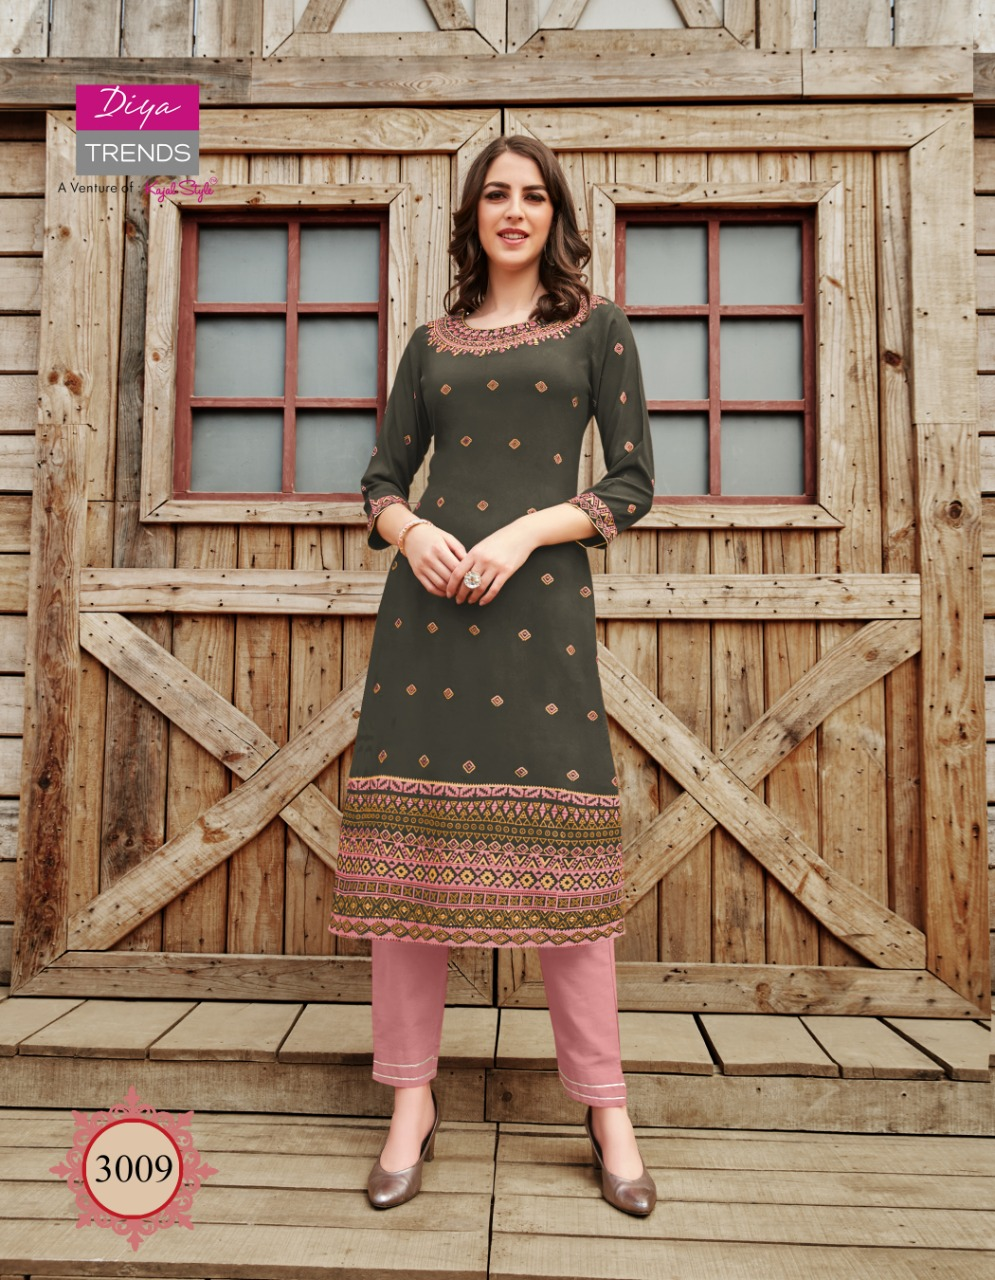 Diya Trends Victoria Vol 3 by Kajal Style Kurti Wholesale Catalog 12 Pcs 9 - Diya Trends Victoria Vol 3 by Kajal Style Kurti Wholesale Catalog 12 Pcs